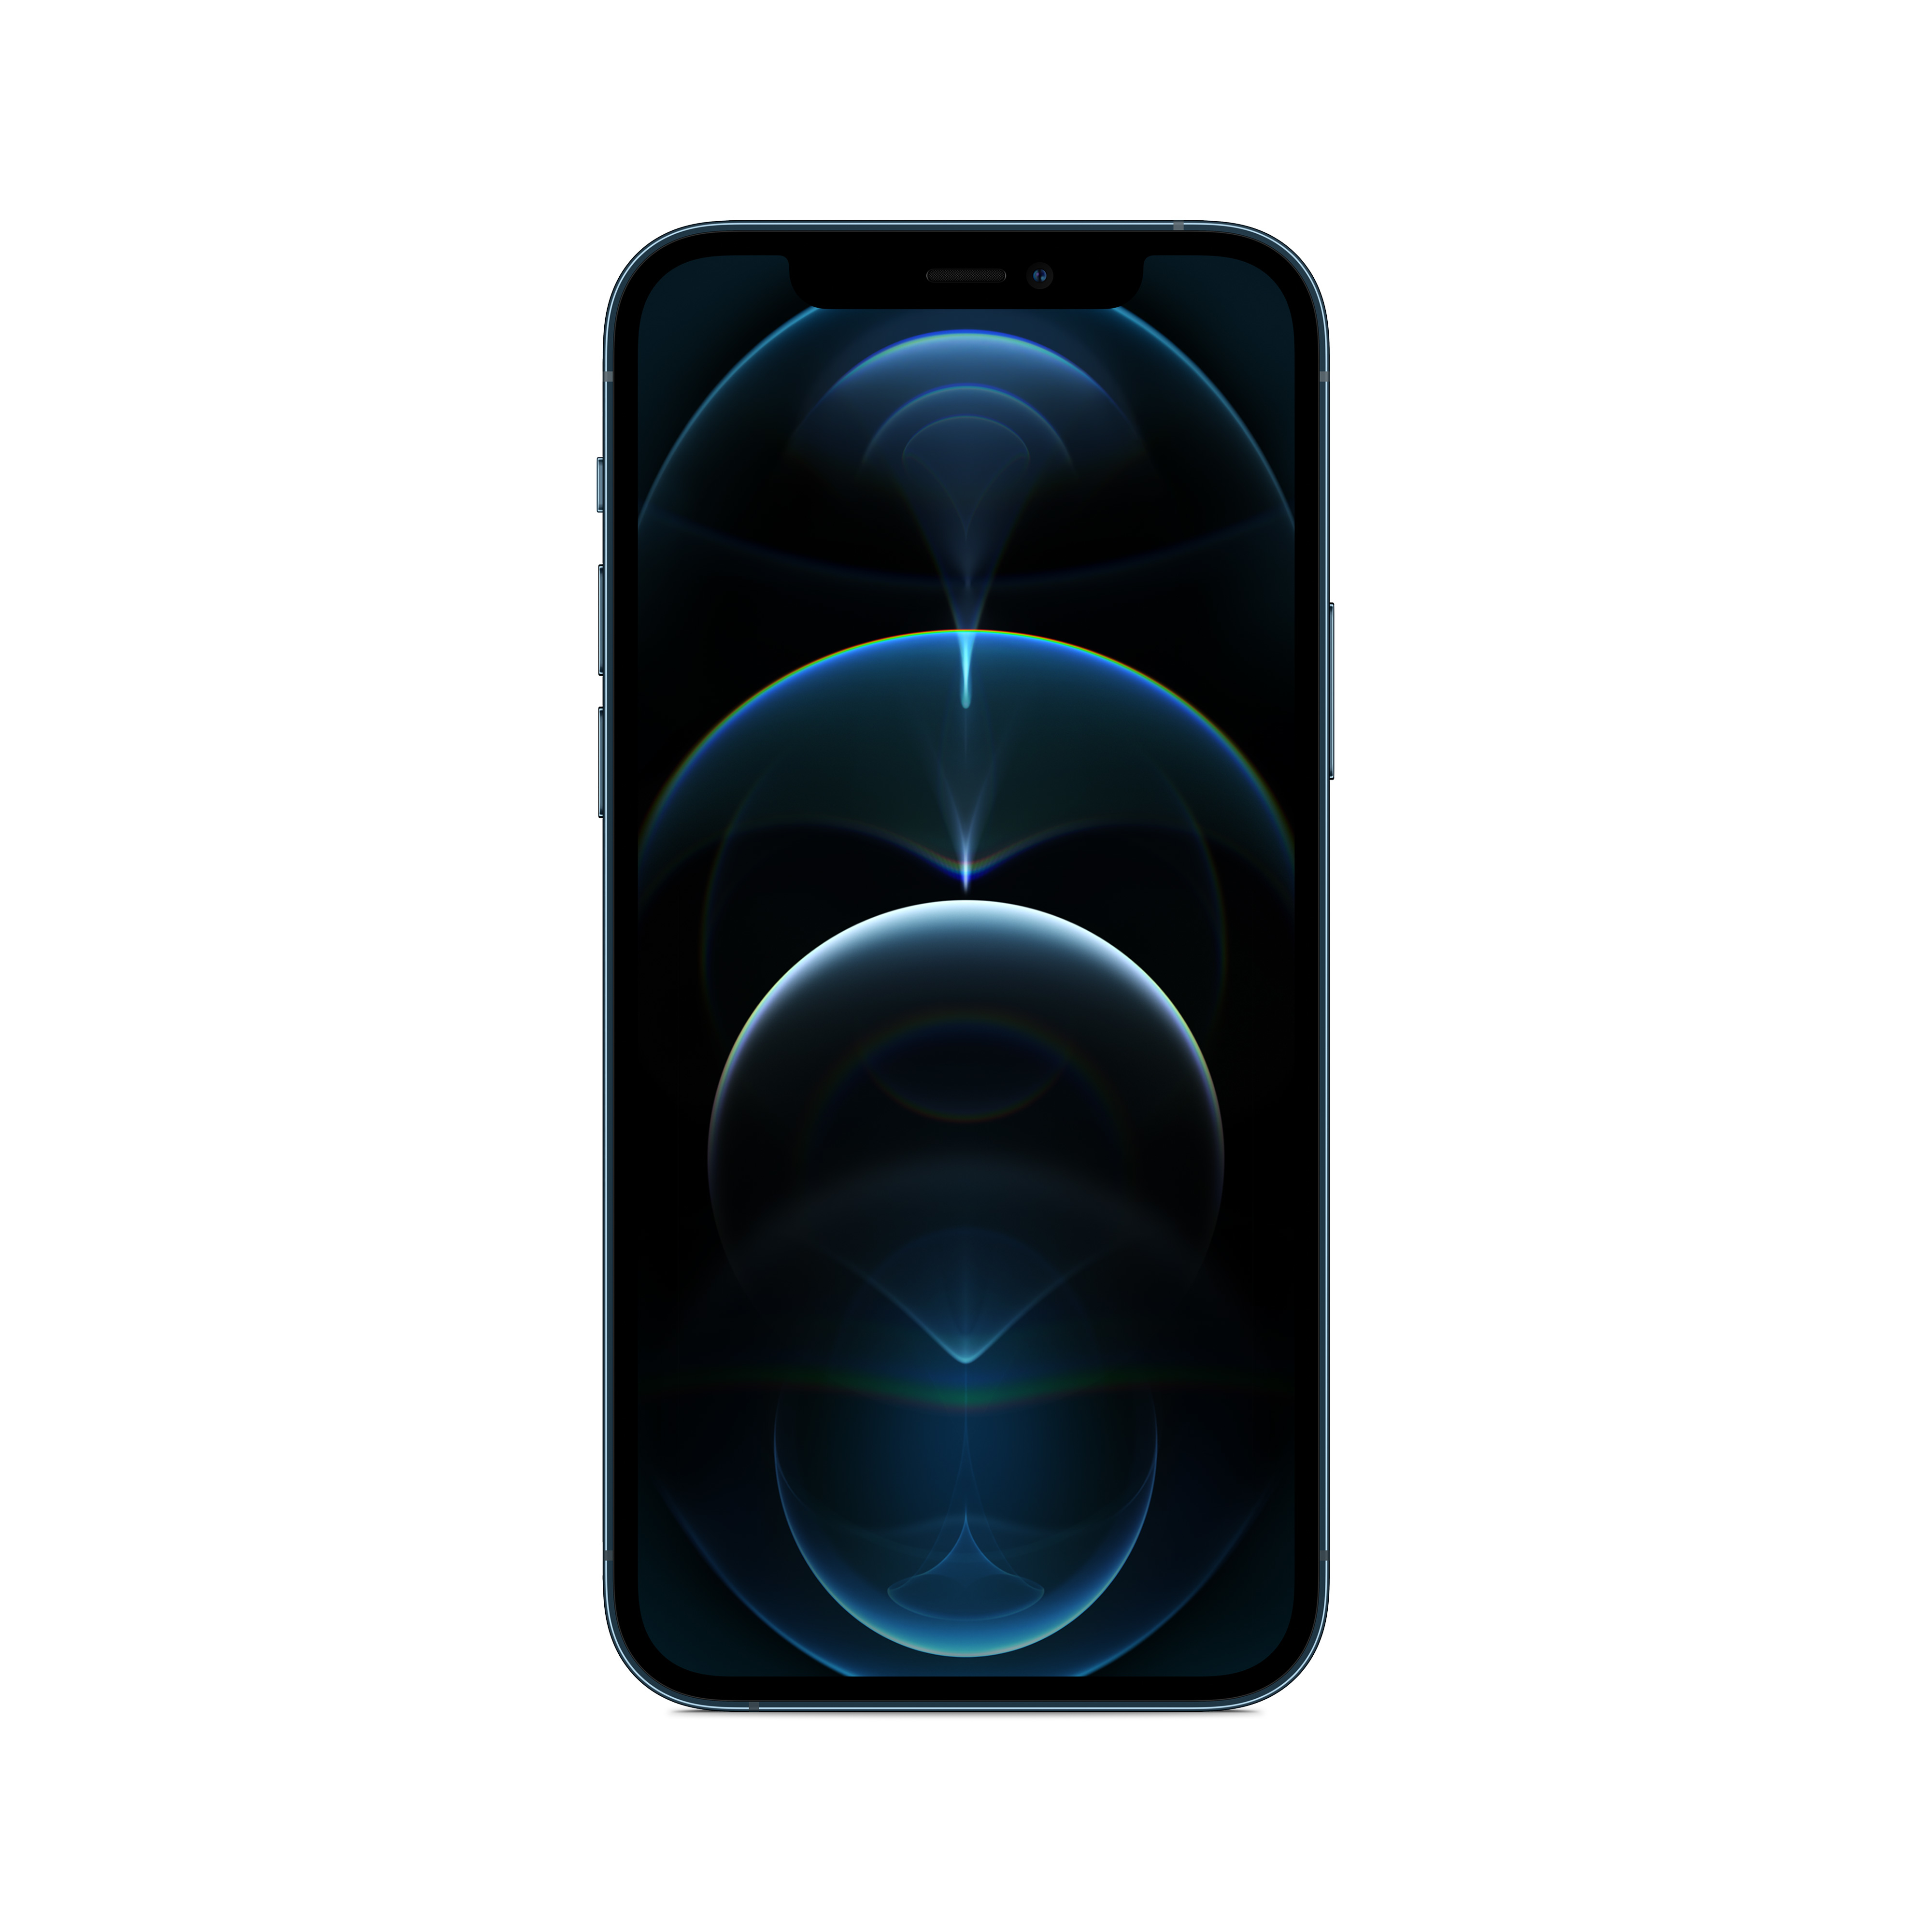 Apple - Iphone 12 Pro 128gb Pacific Blue